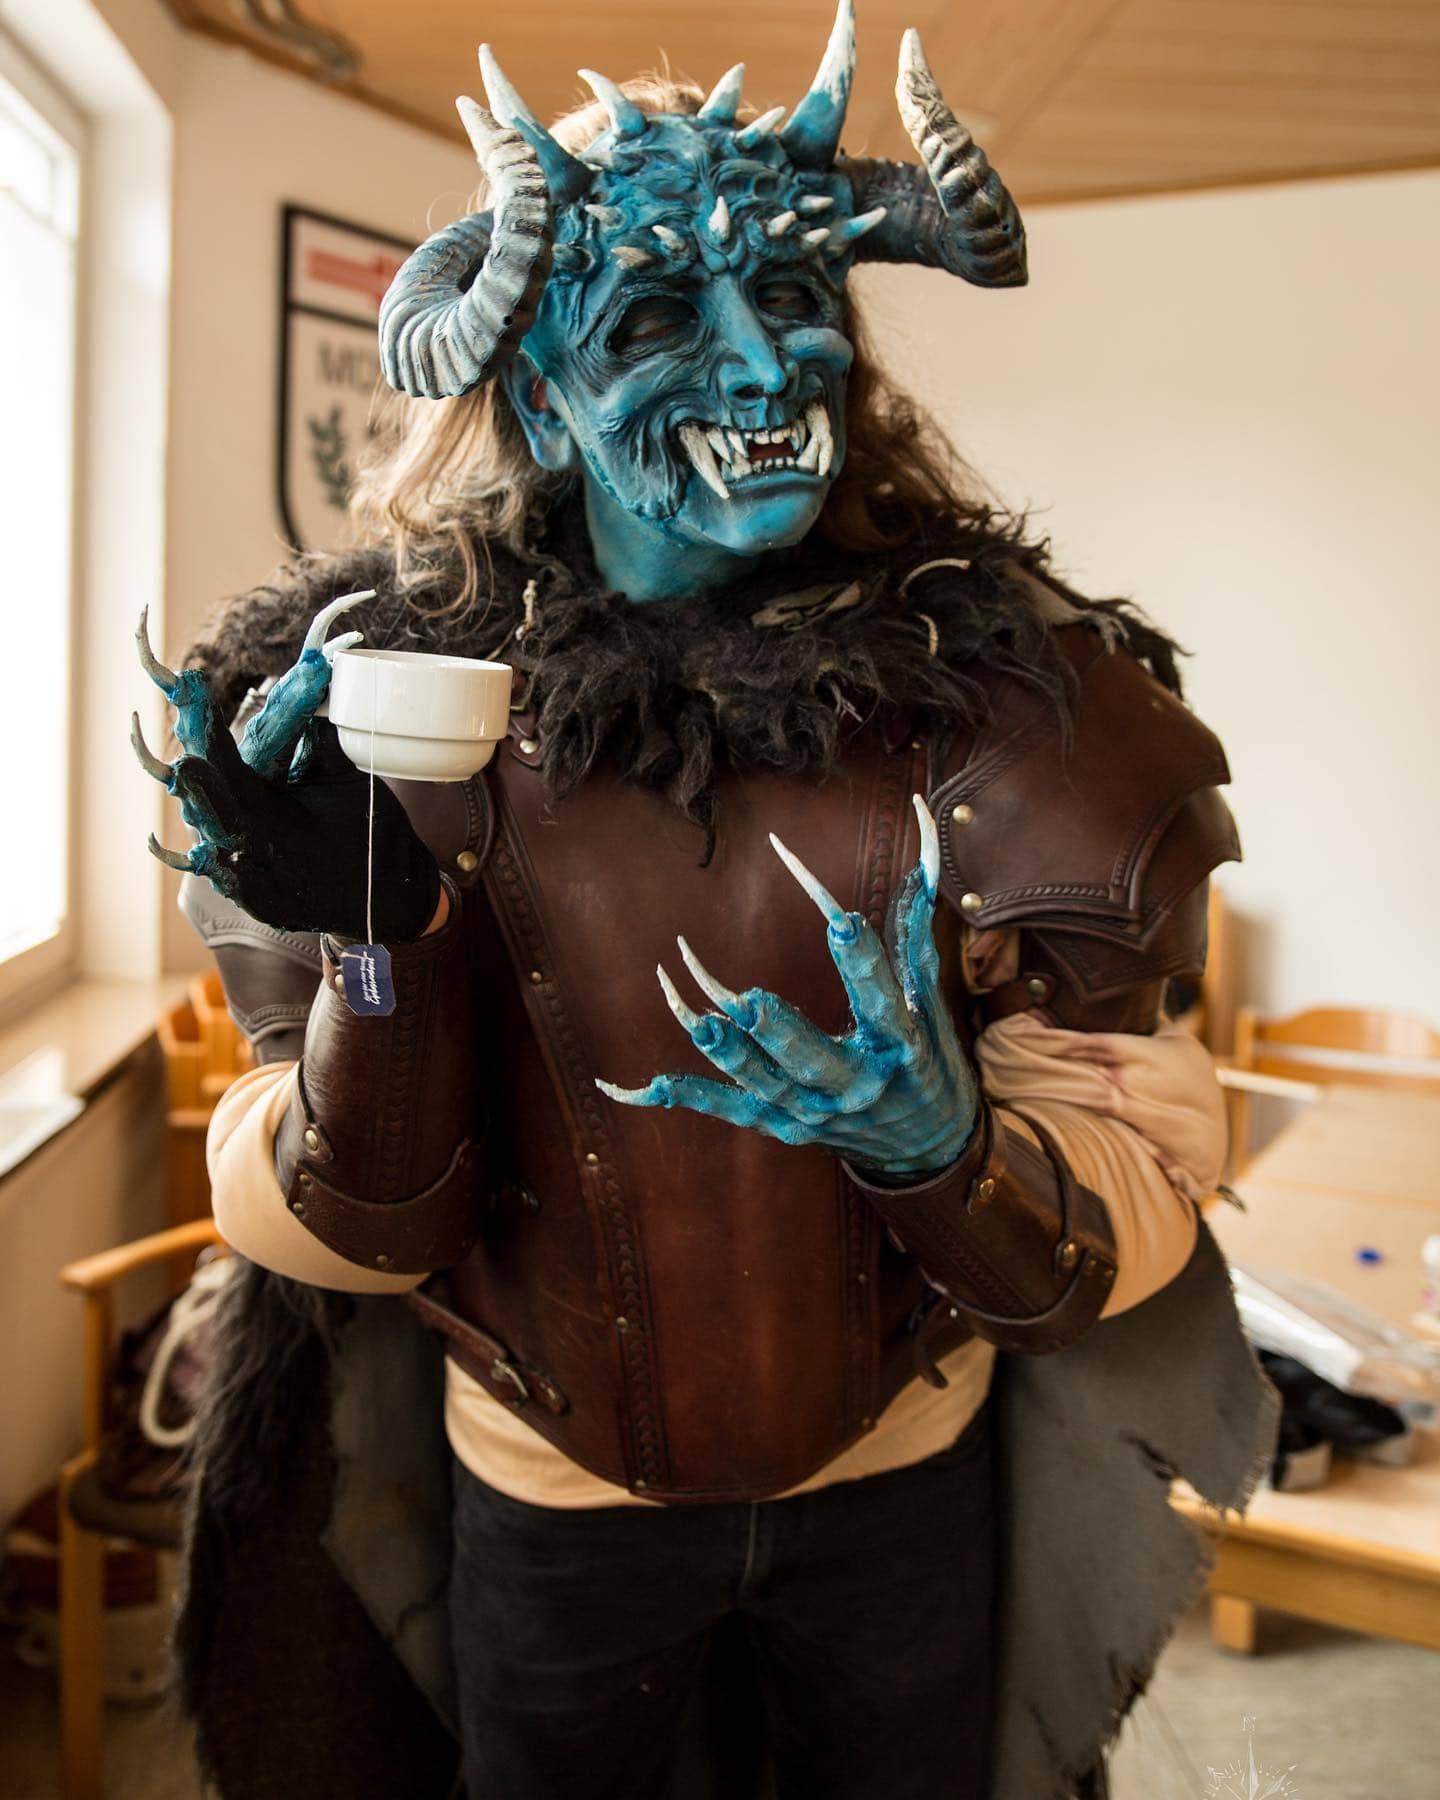 Instagram:Demon doing things: Demon having a good cup of tea… 👹😁 Pic.: @sven_vittoz_photography #demondoingthings #demon #bluede